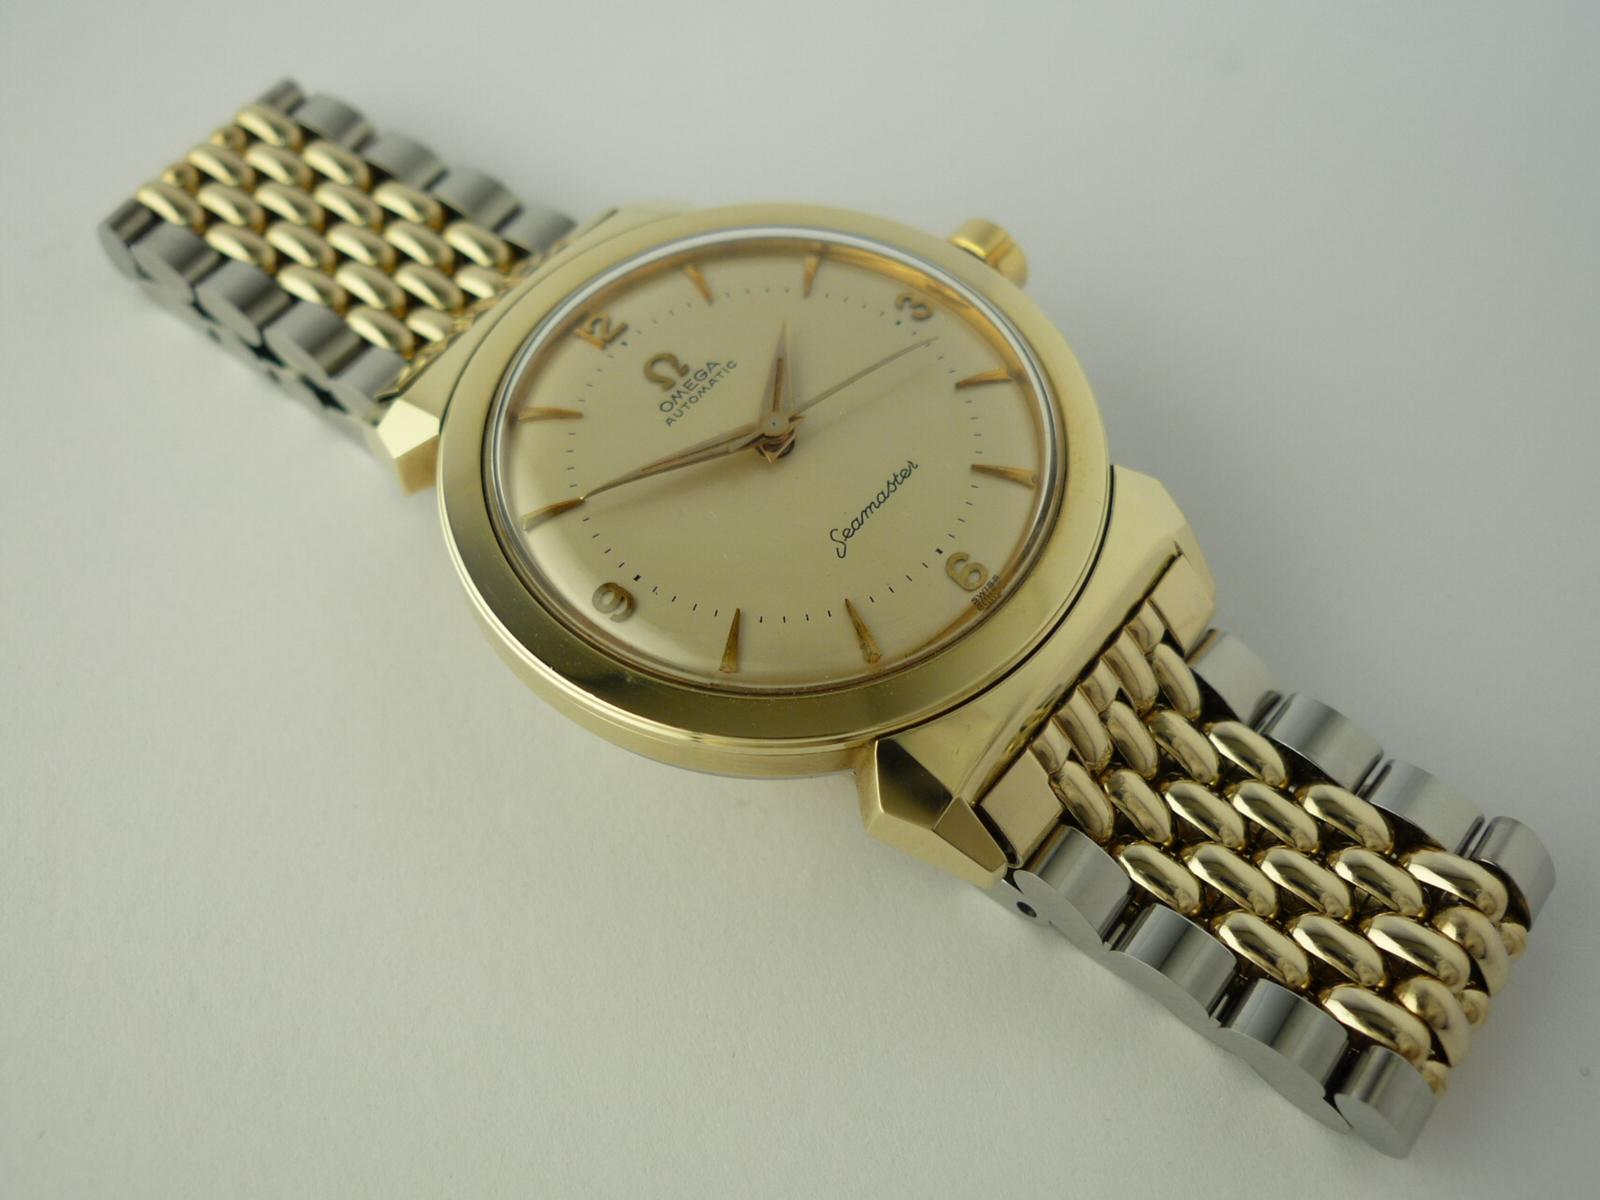 Omega Automatic Seamaster wristwatch ref 143-63-3 (1956)